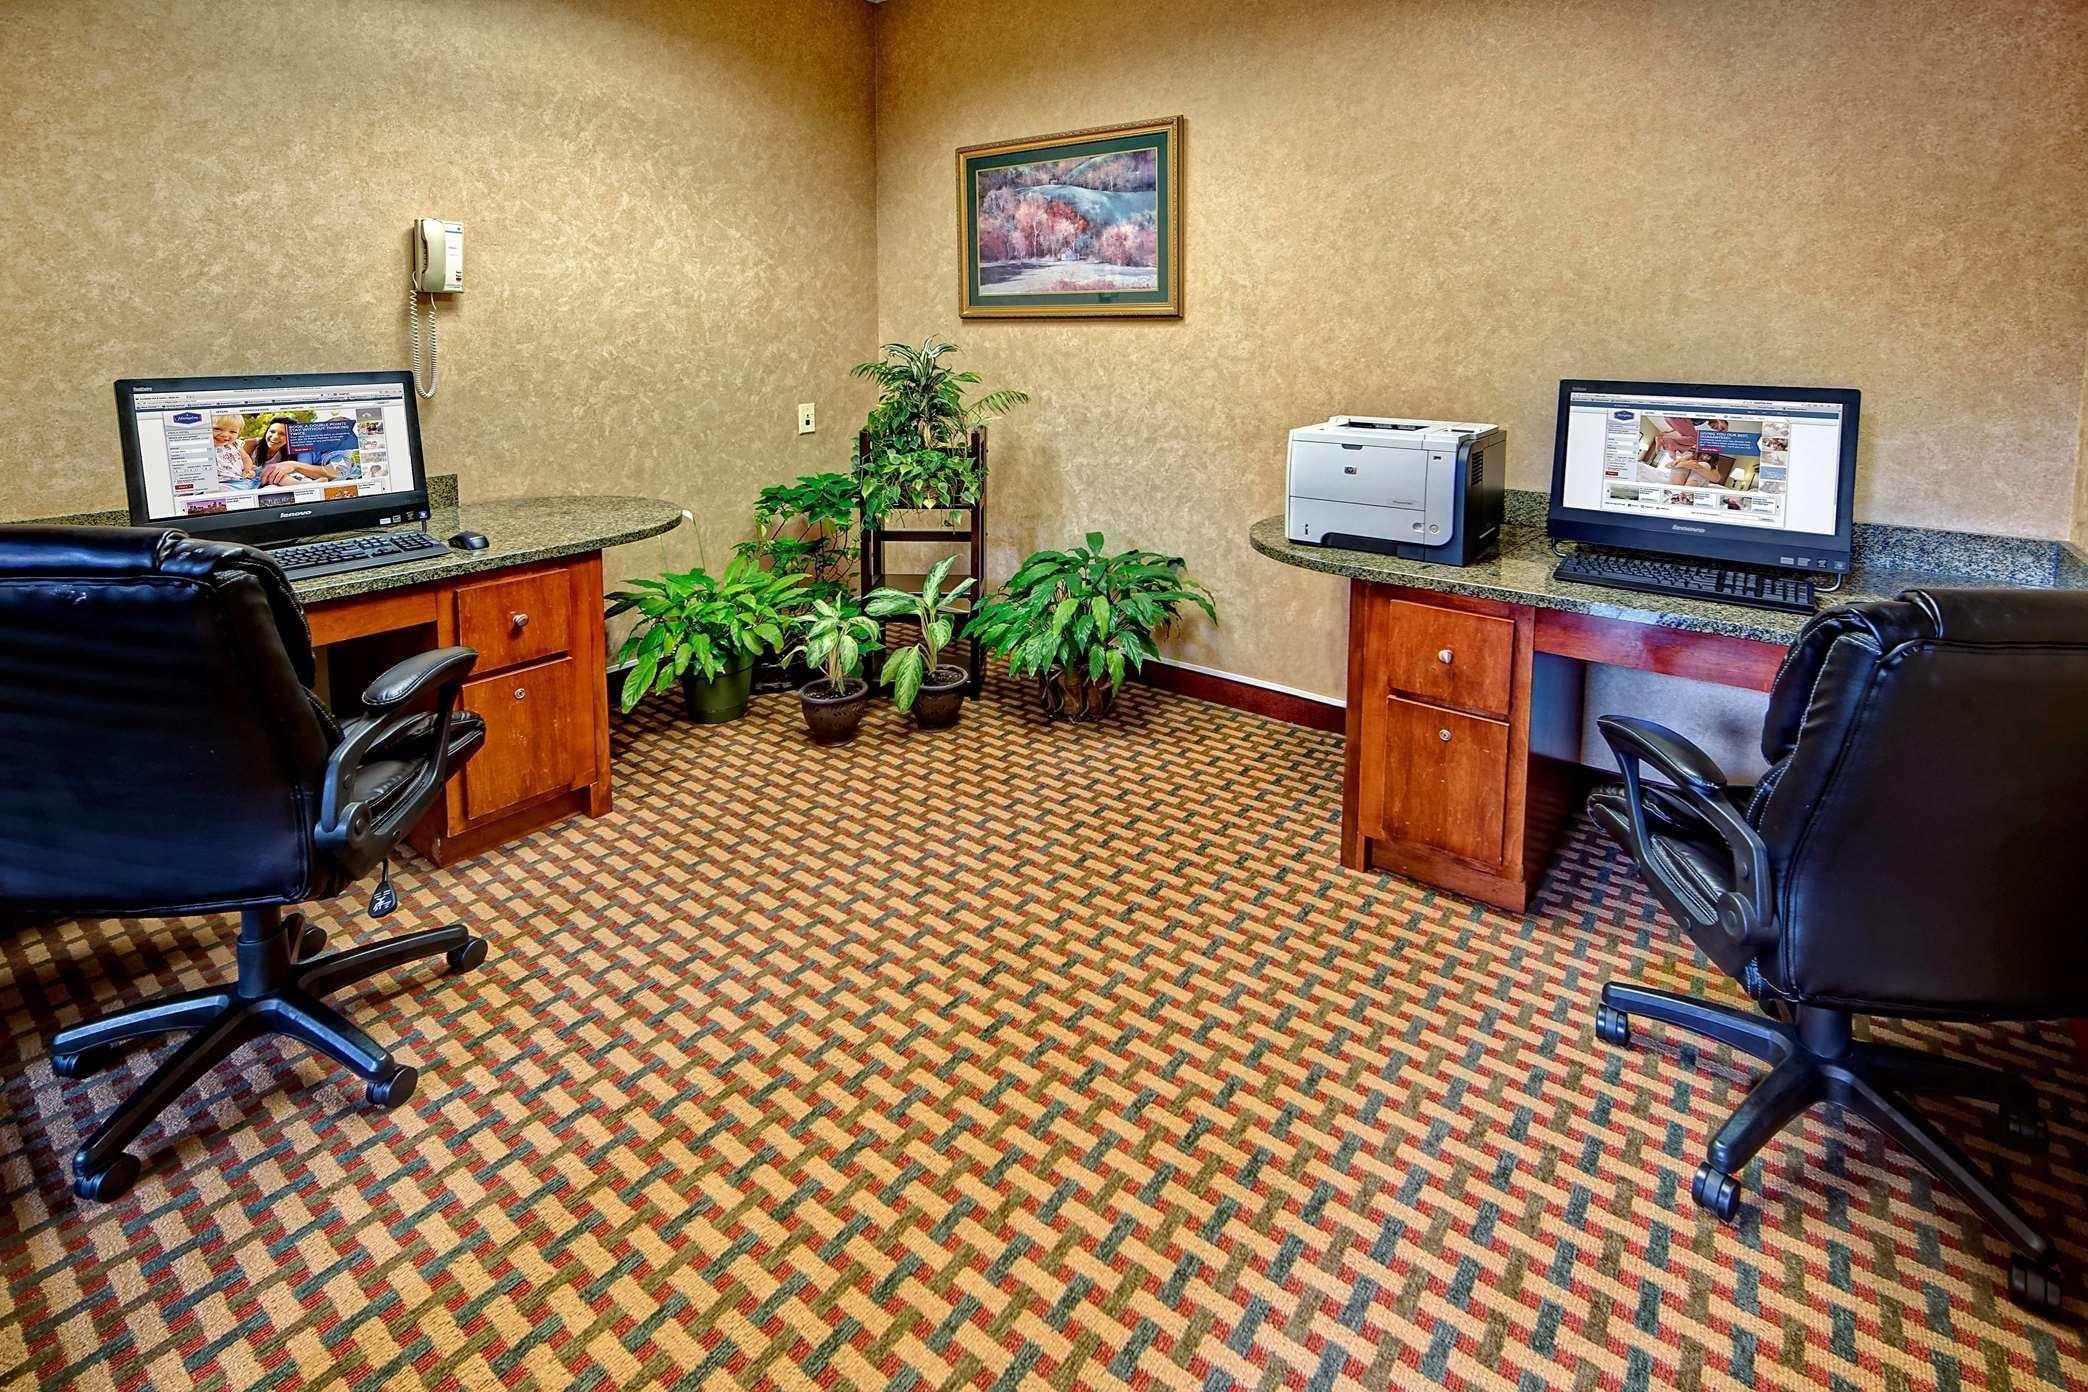 Hampton Inn & Suites Cashiers-Sapphire Valley image 31